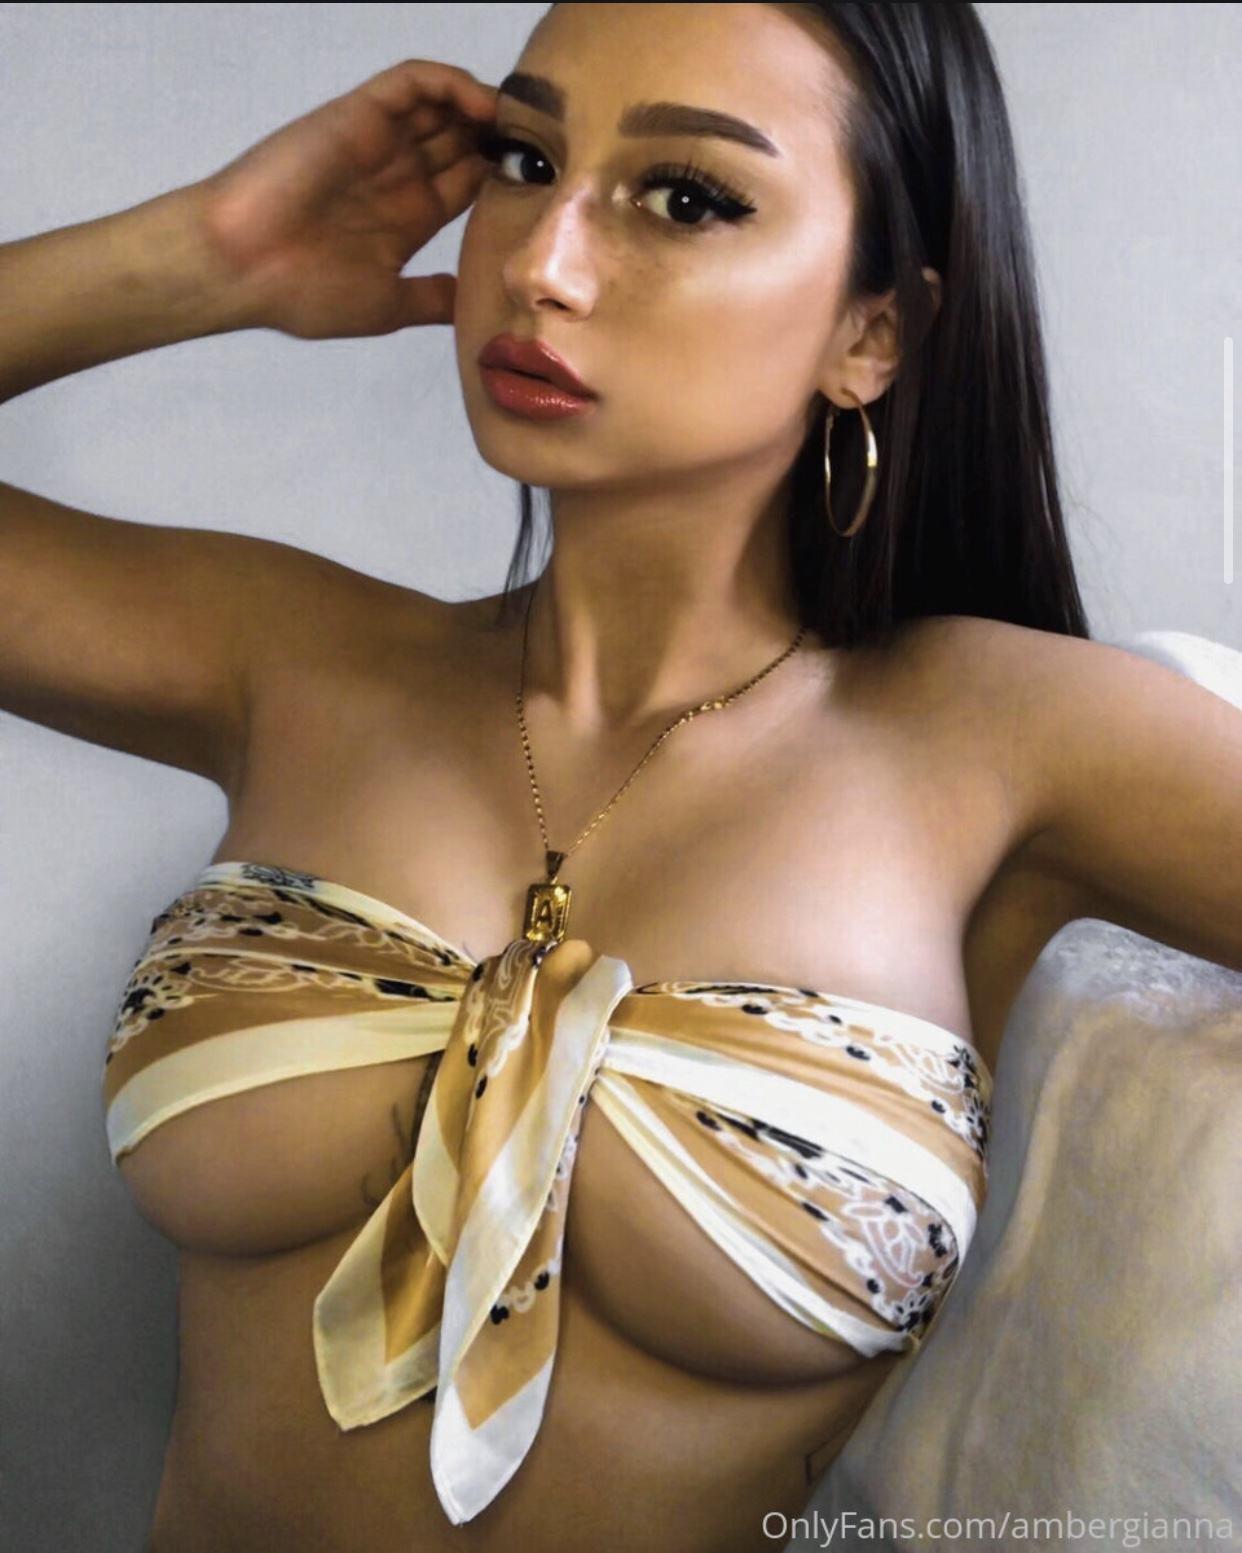 Amber Gianna Leaked 0029